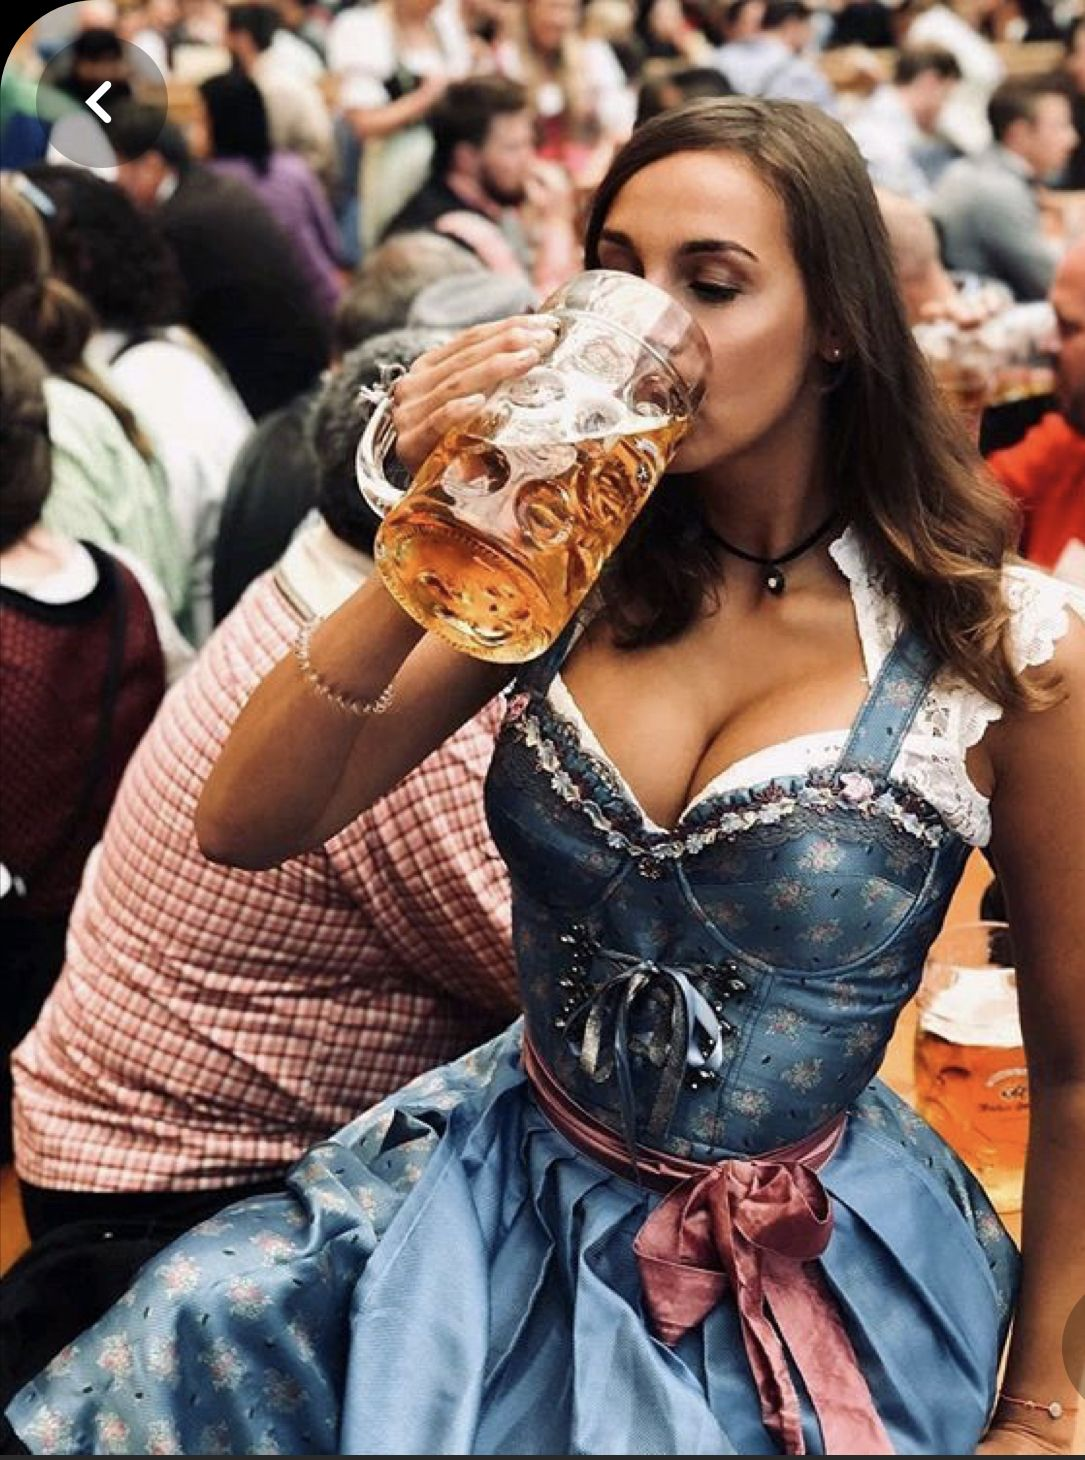 Kellnerin nackt oktoberfest Neuer Trend